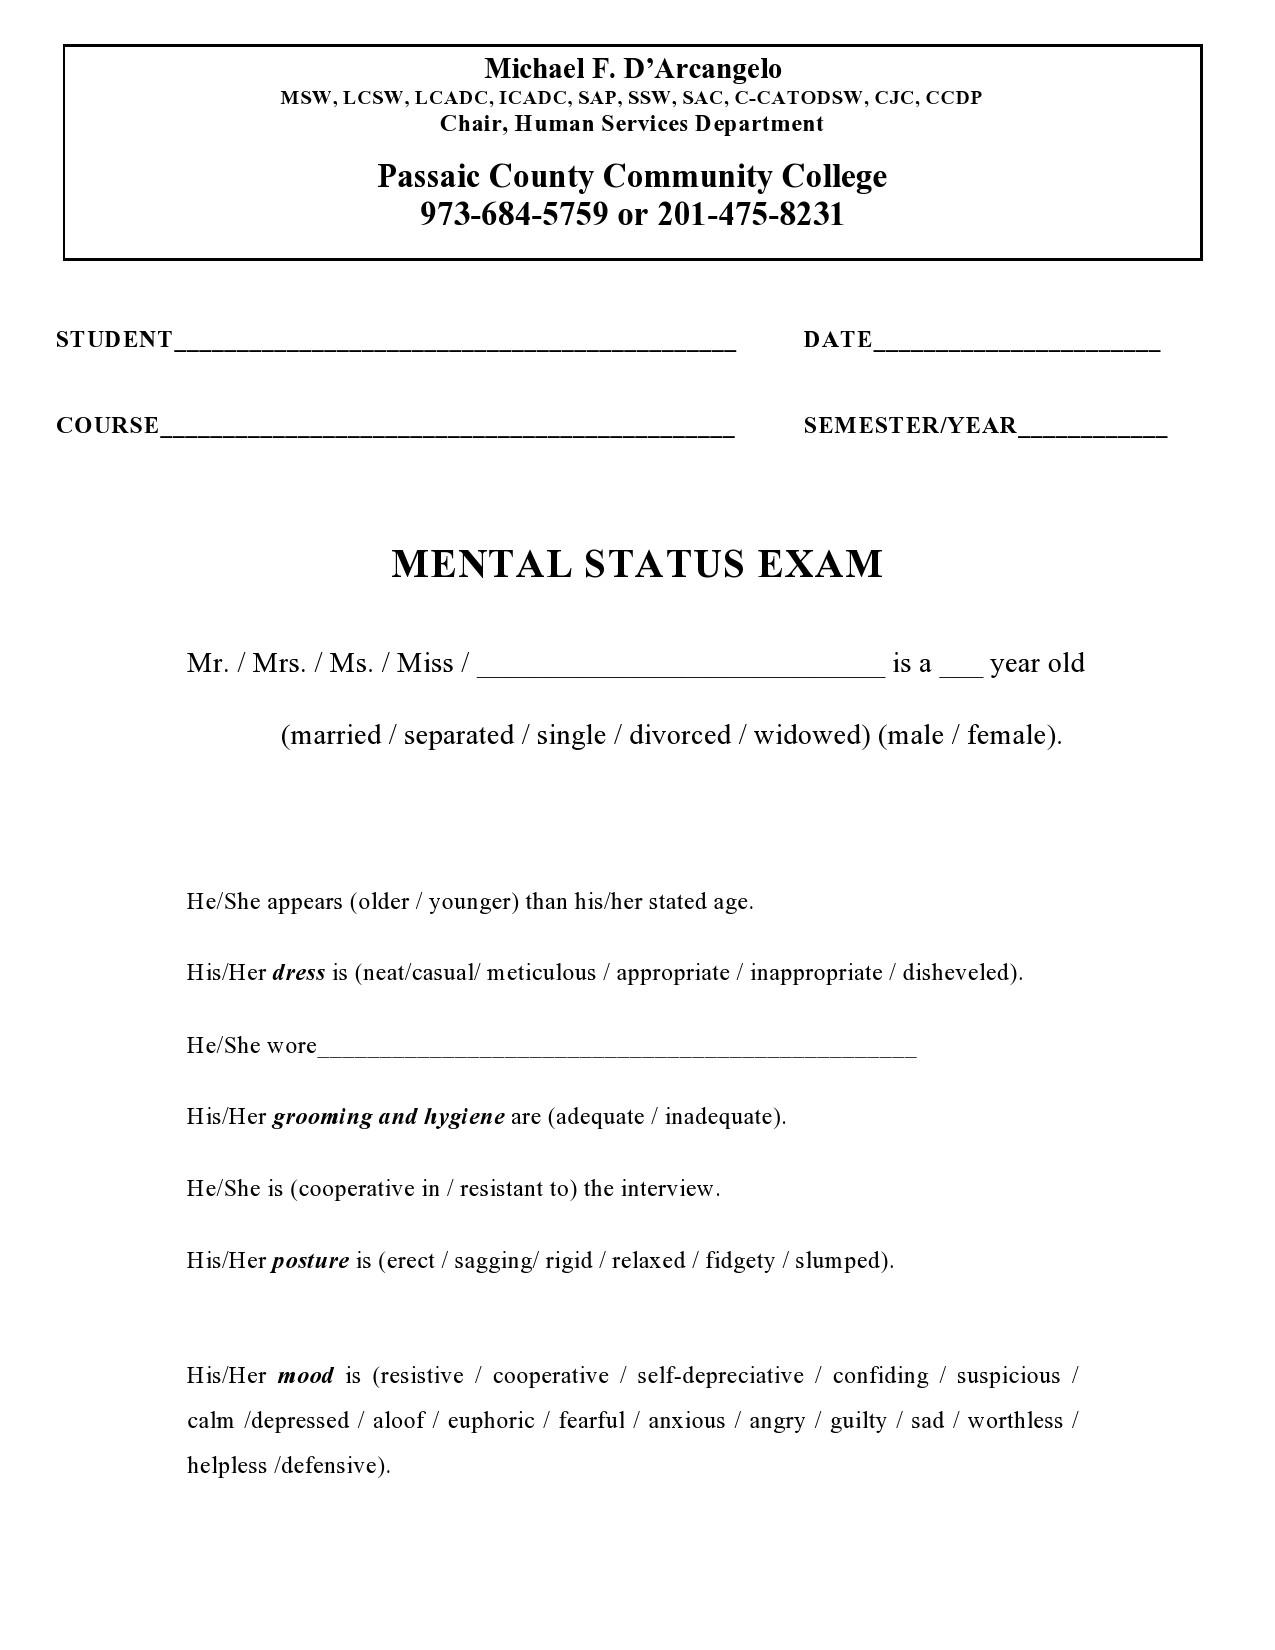 Free mental status exam template 42